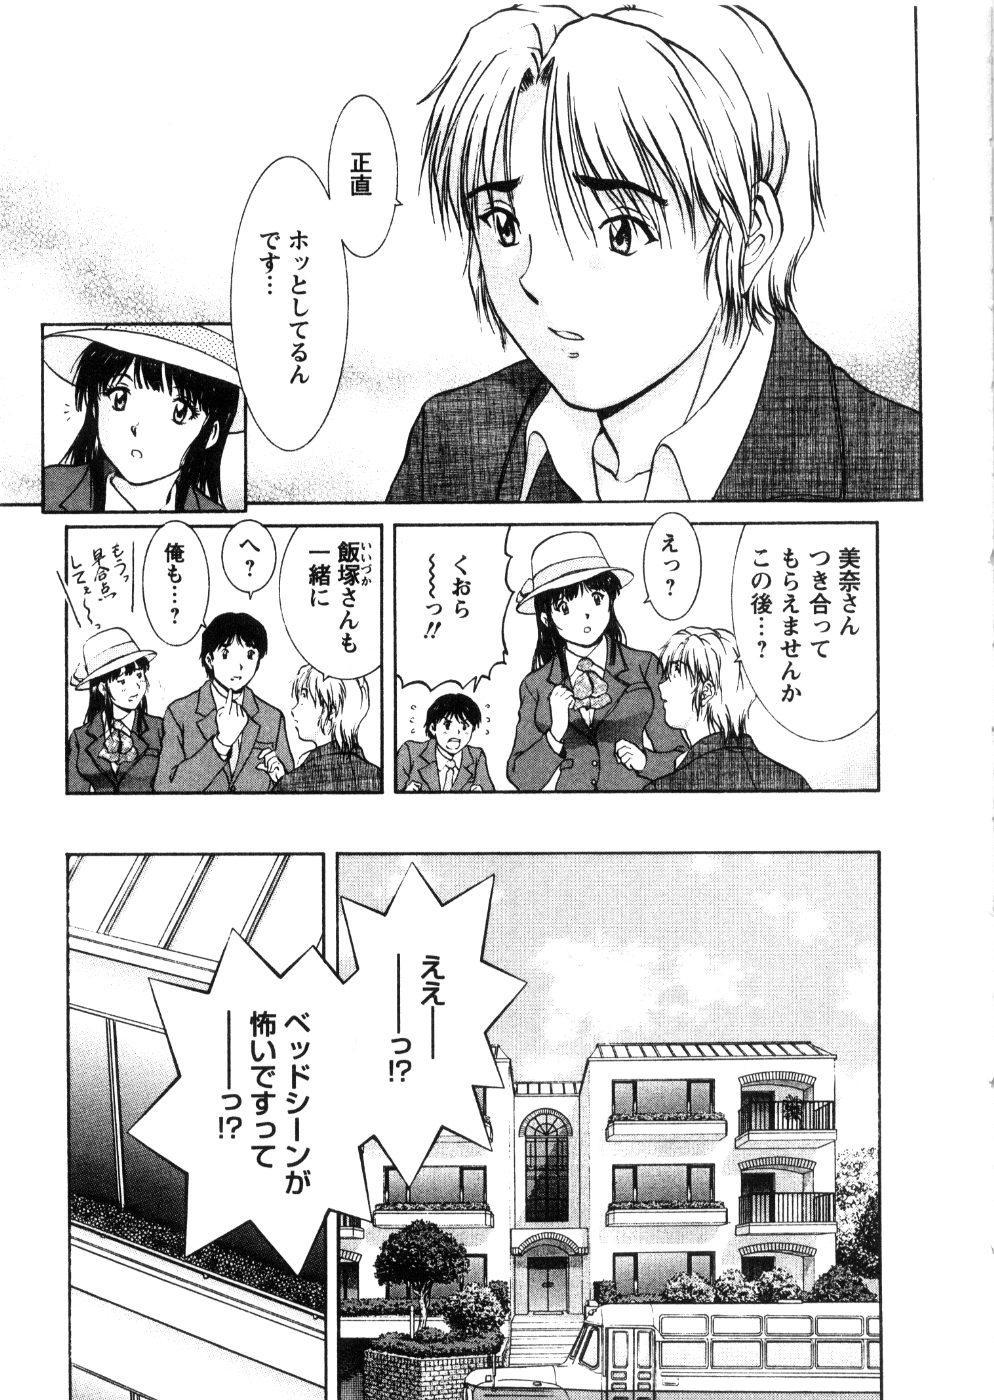 Oneechan-tachi ga Yatte Kuru 03 156